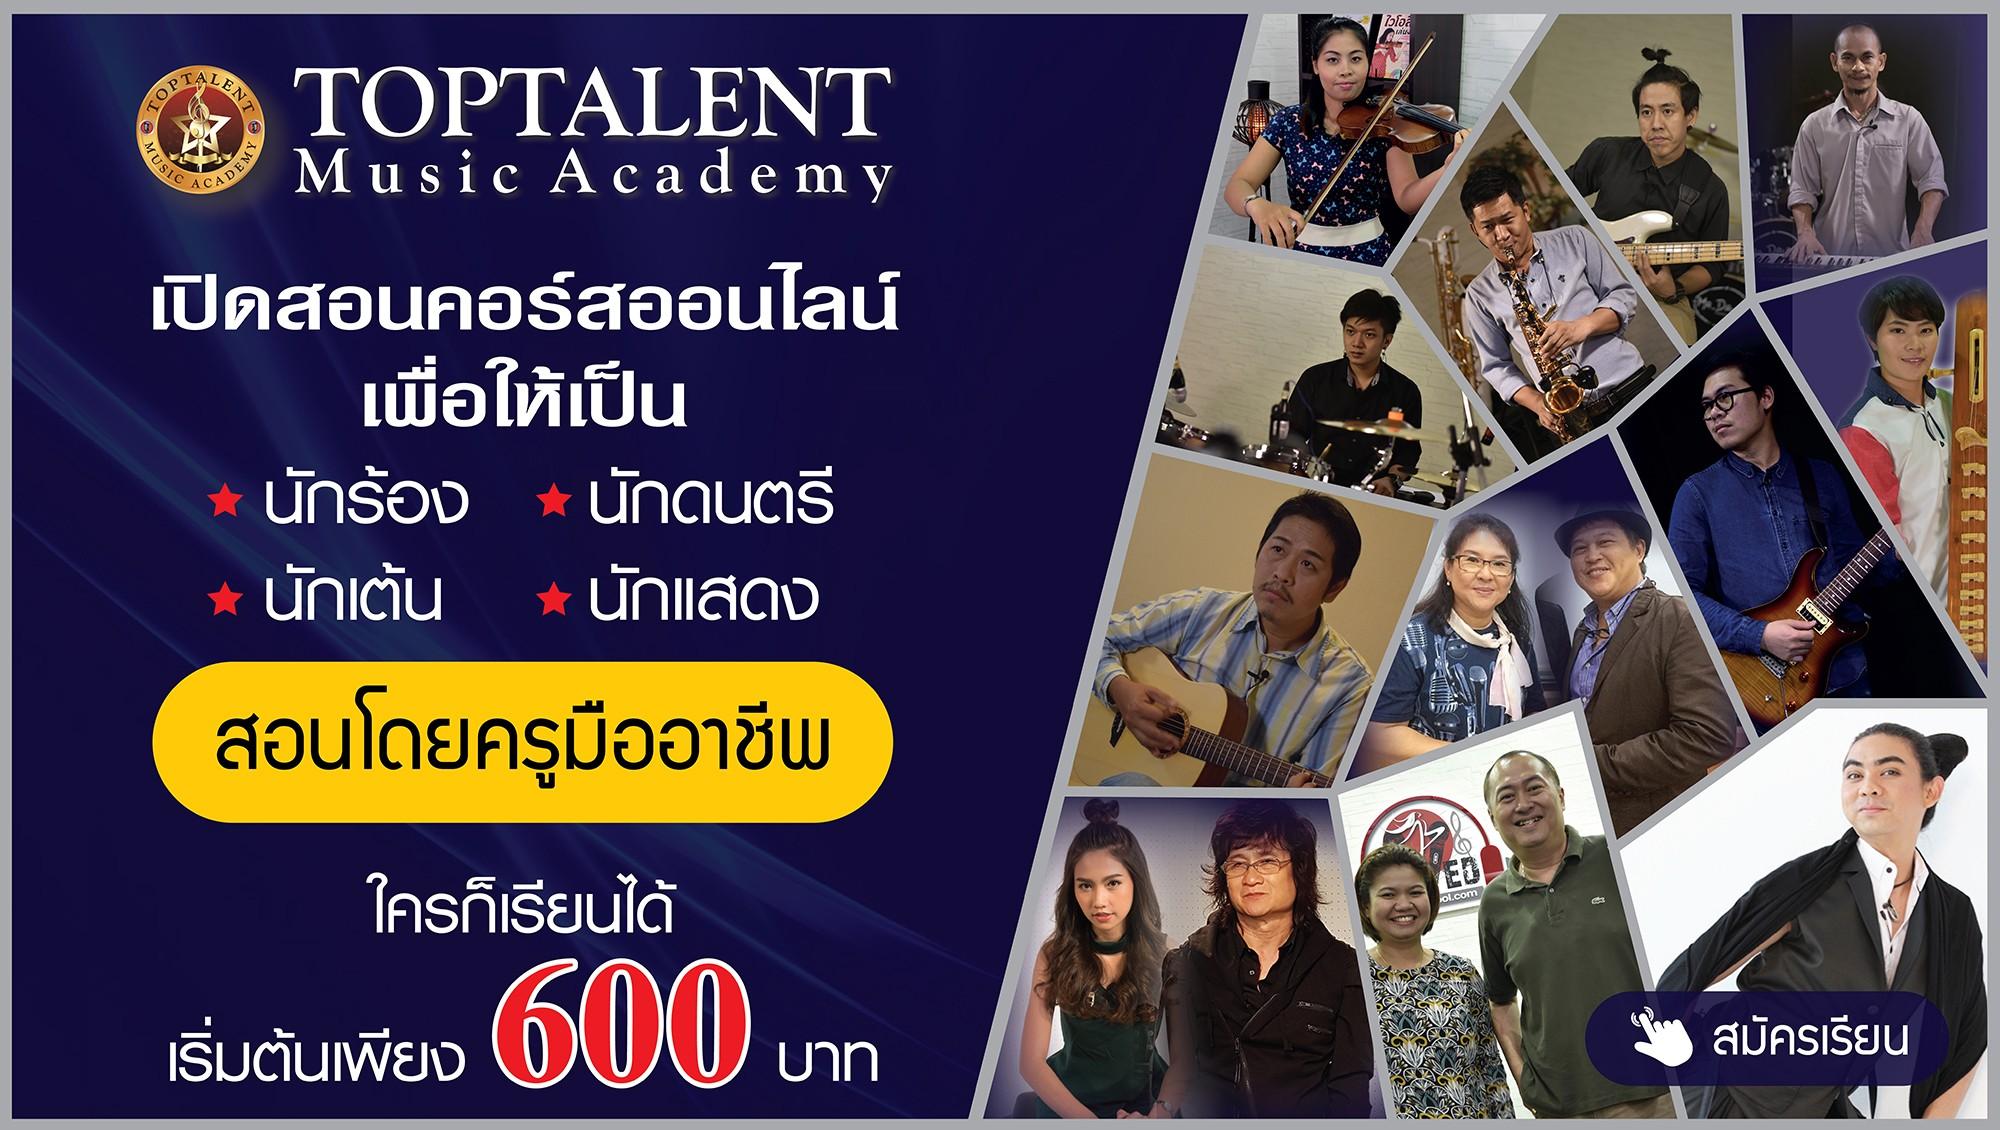 toptalent music academy